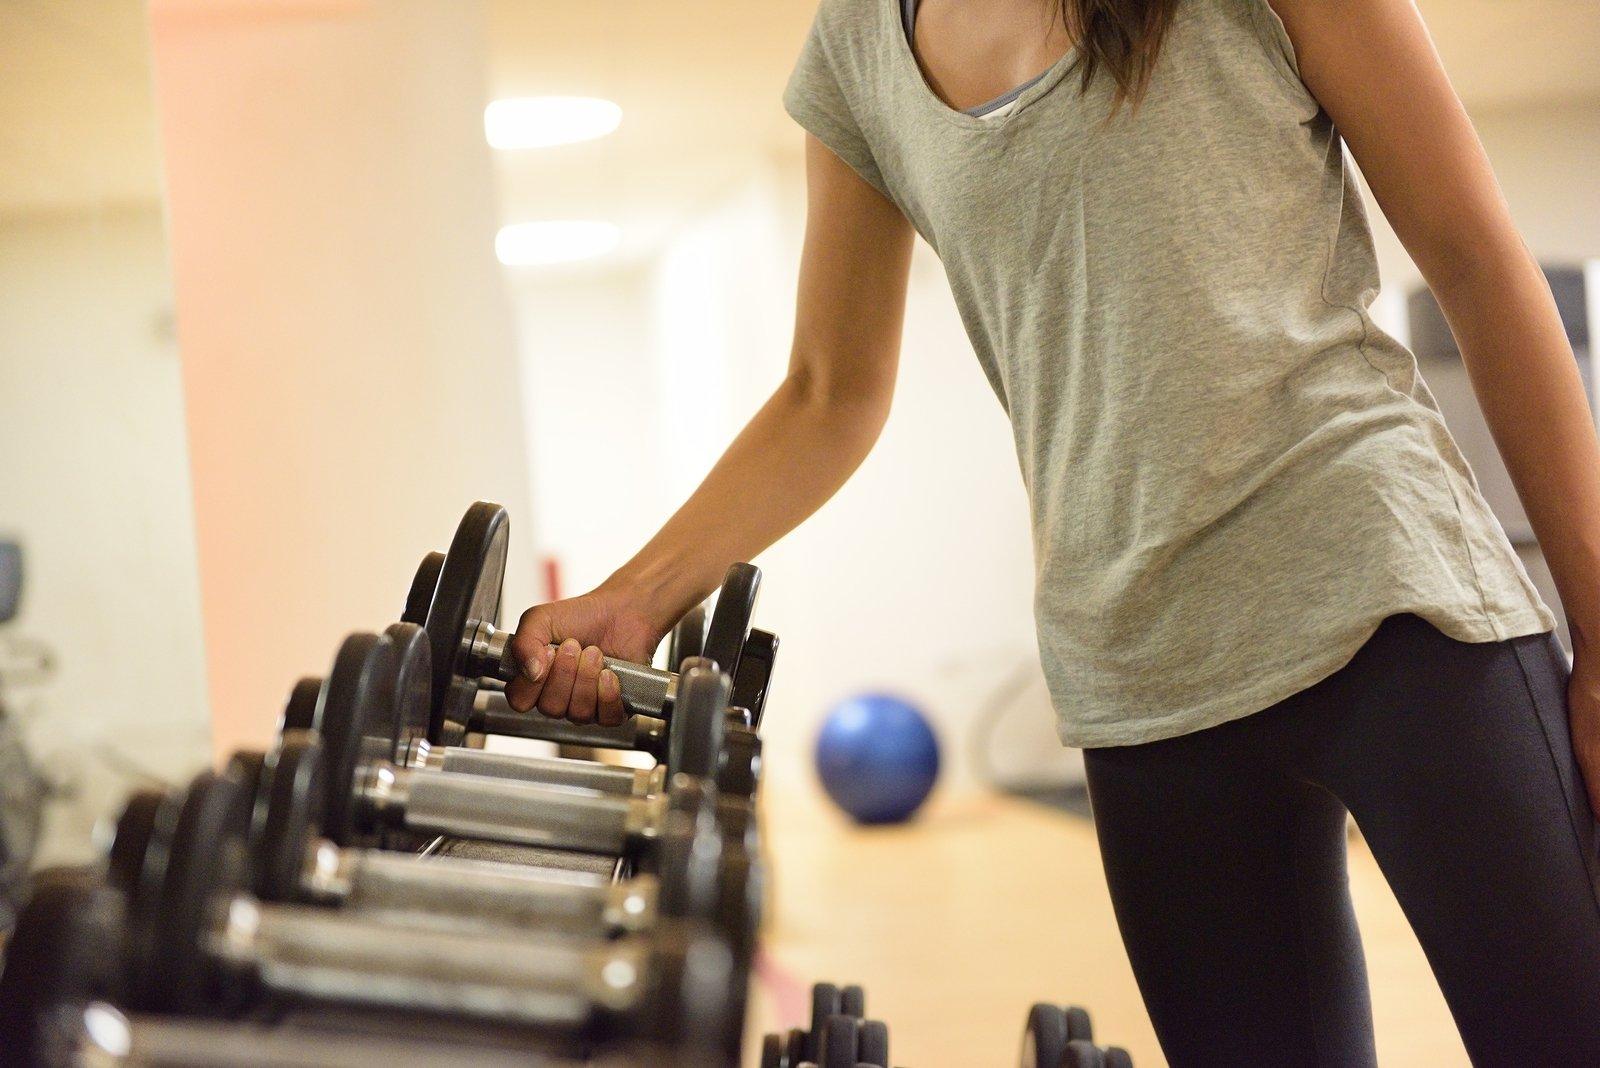 bigstock-Gym-woman-strength-training